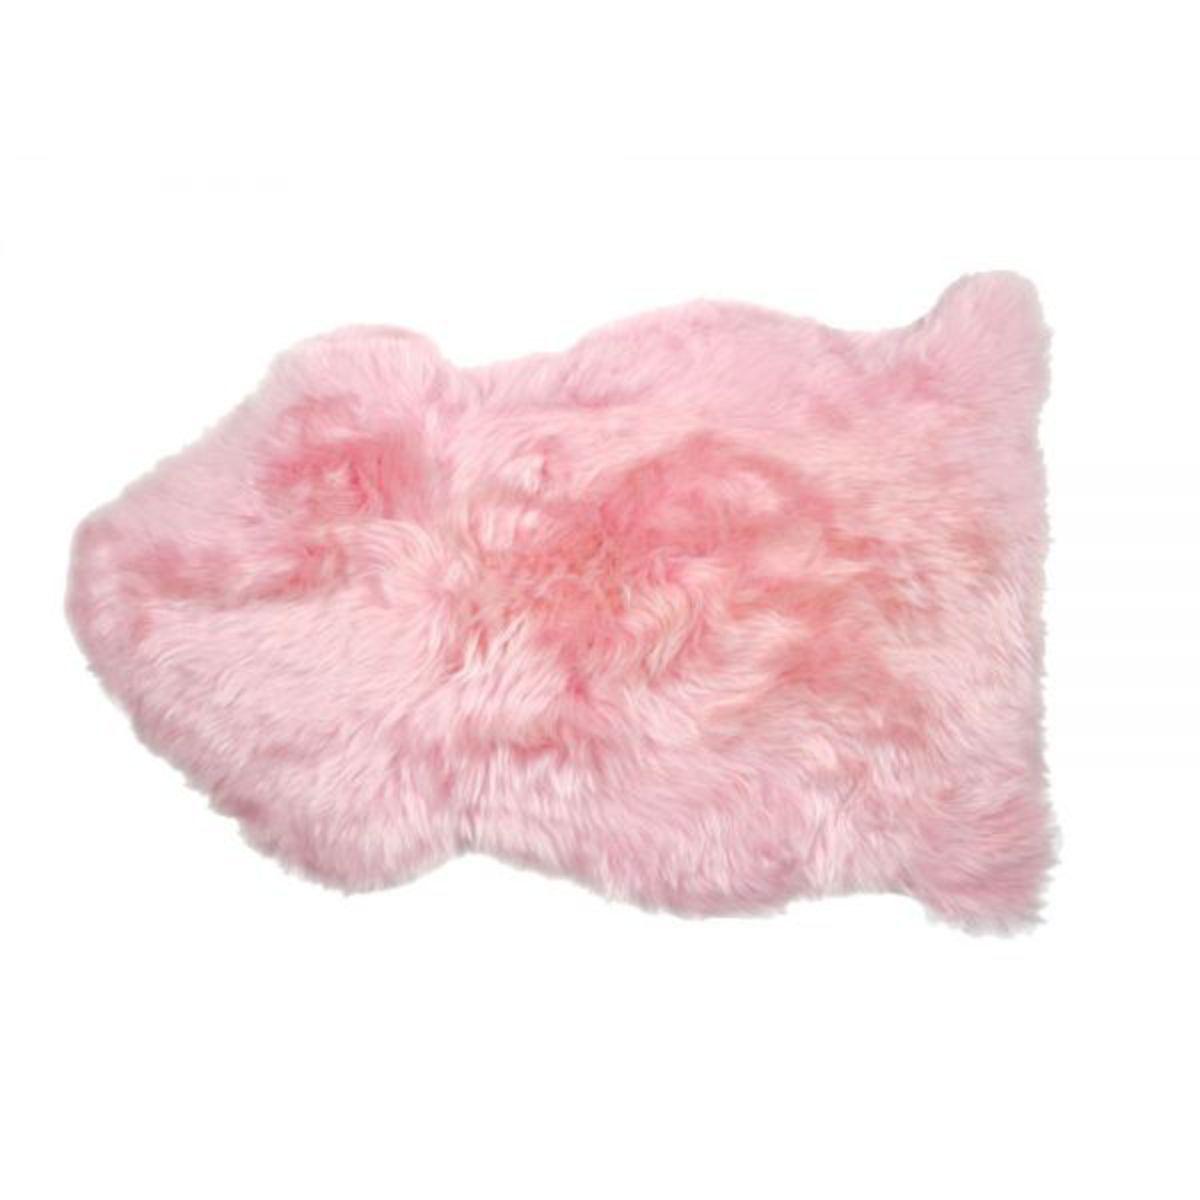 tapis peau pas cher tapis peau pas cher with tapis peau pas cher avoir un tapis zbre sans. Black Bedroom Furniture Sets. Home Design Ideas